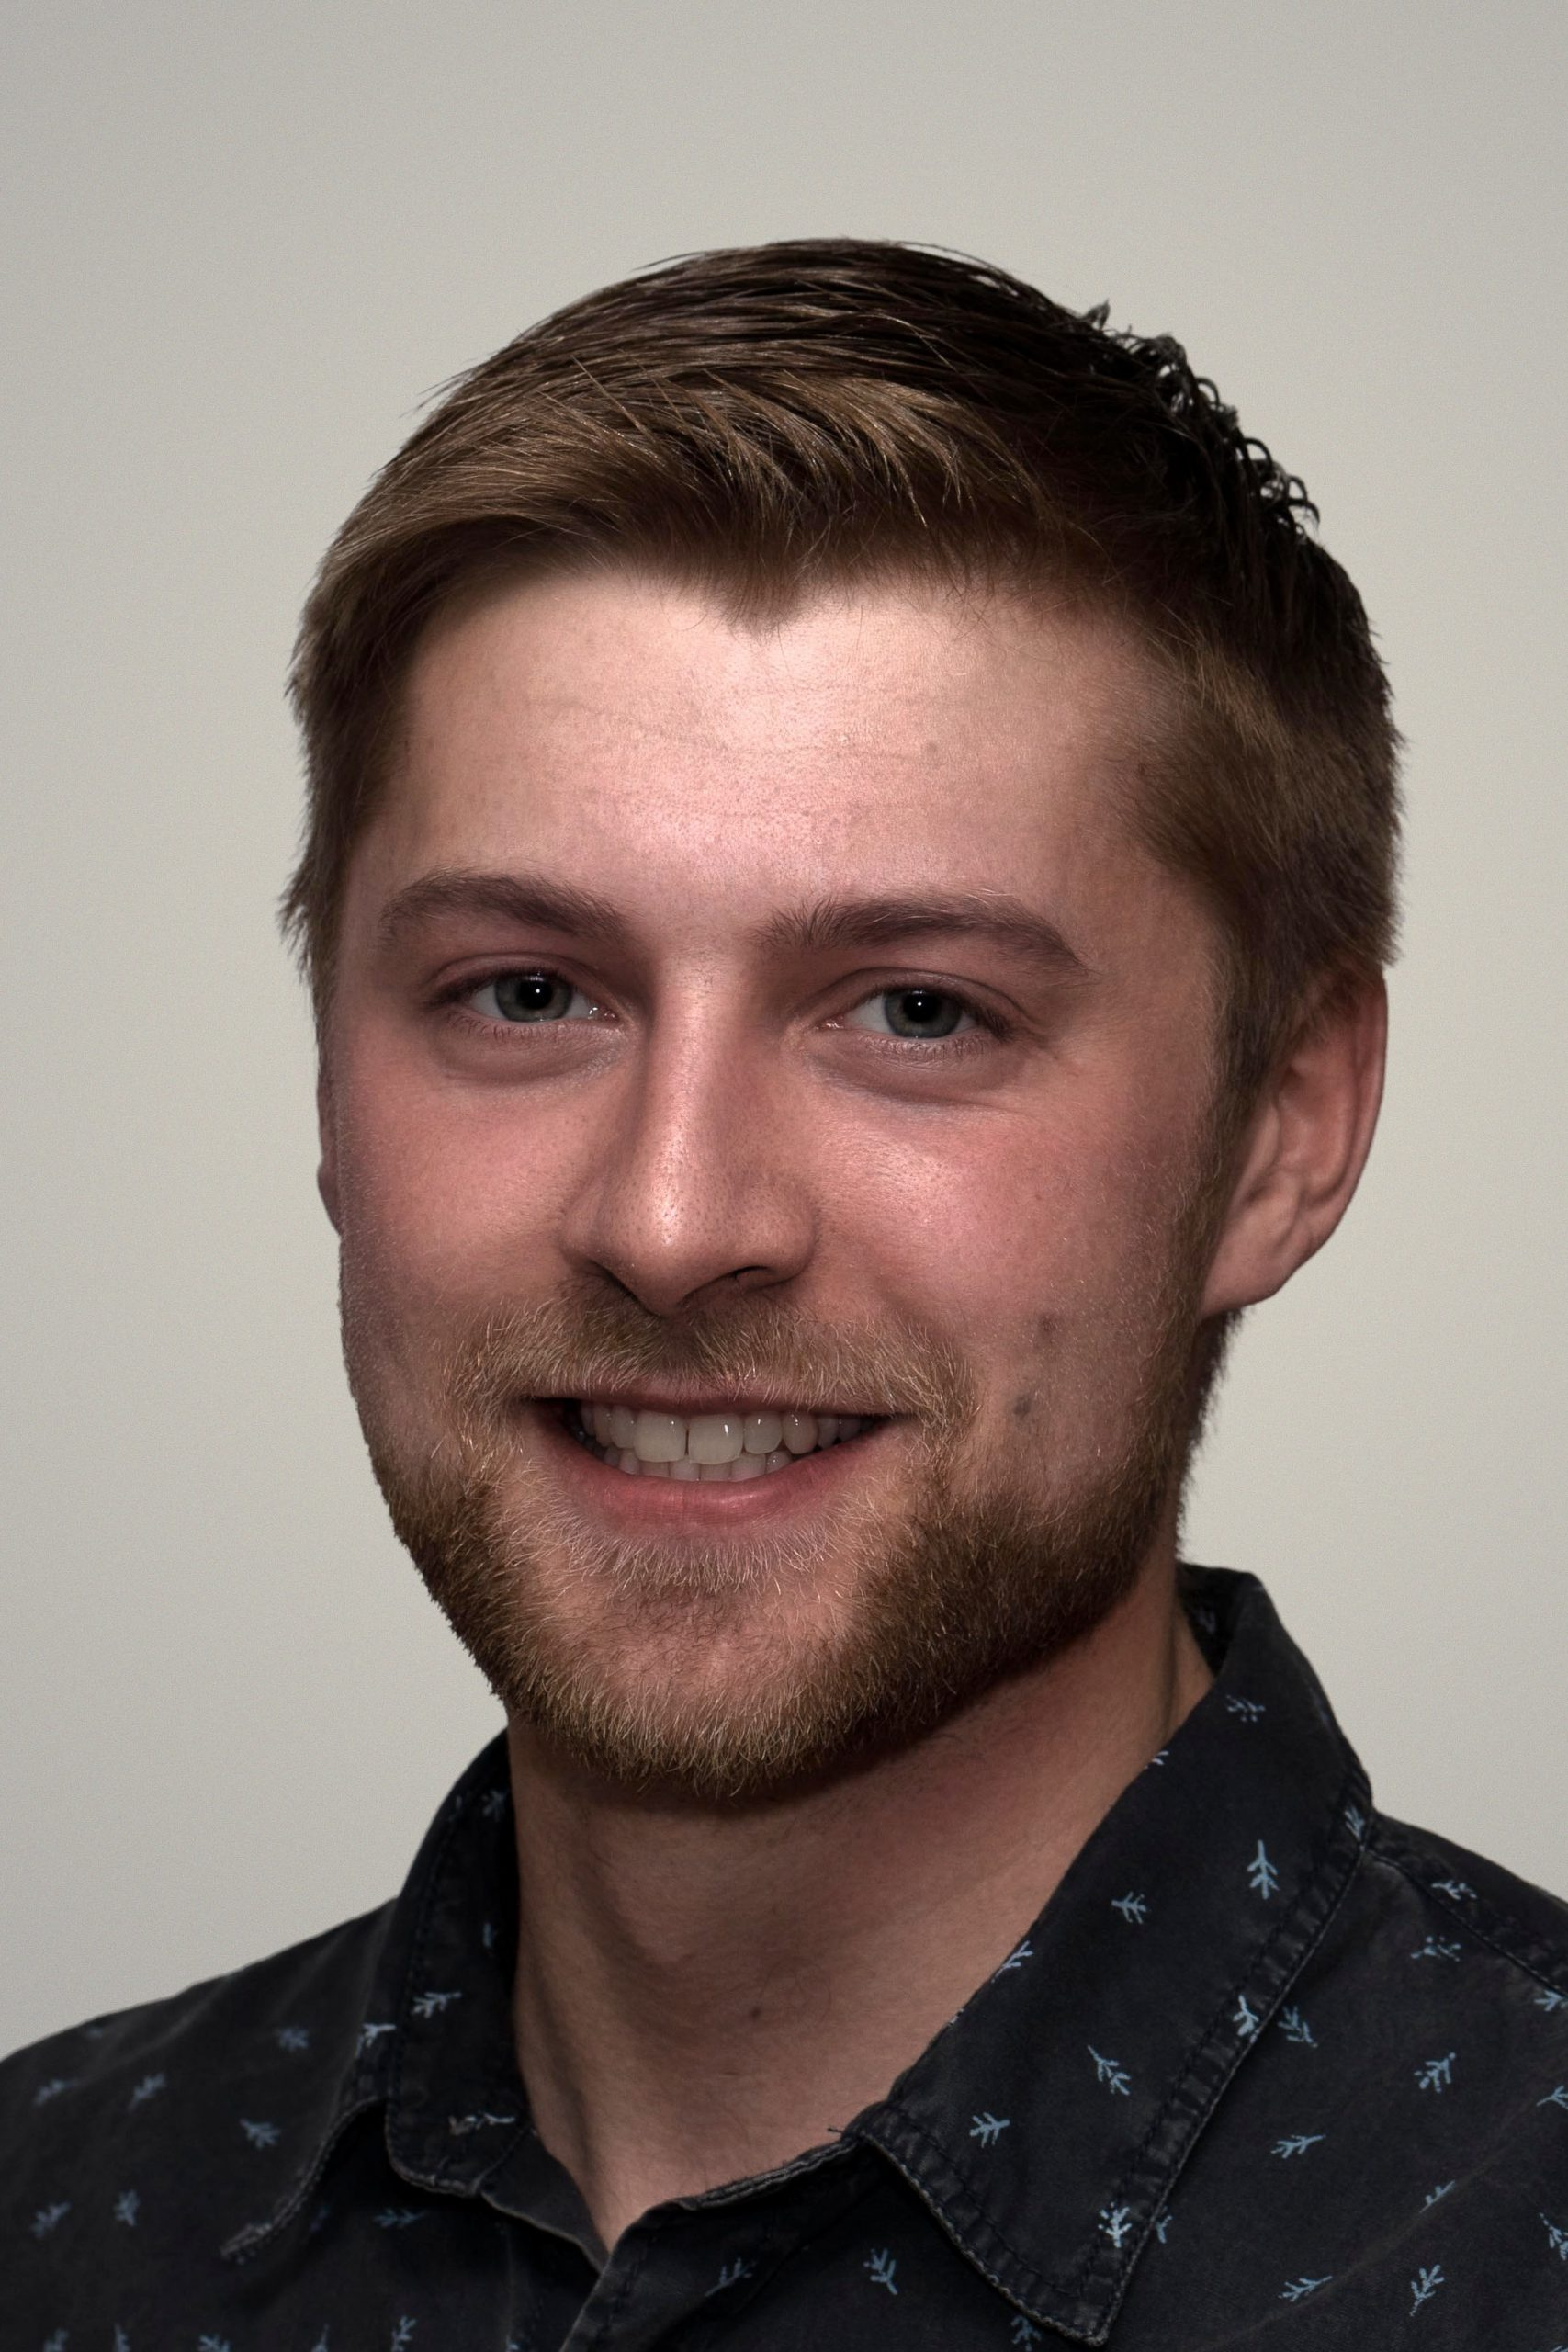 Simon Schmidt (25)